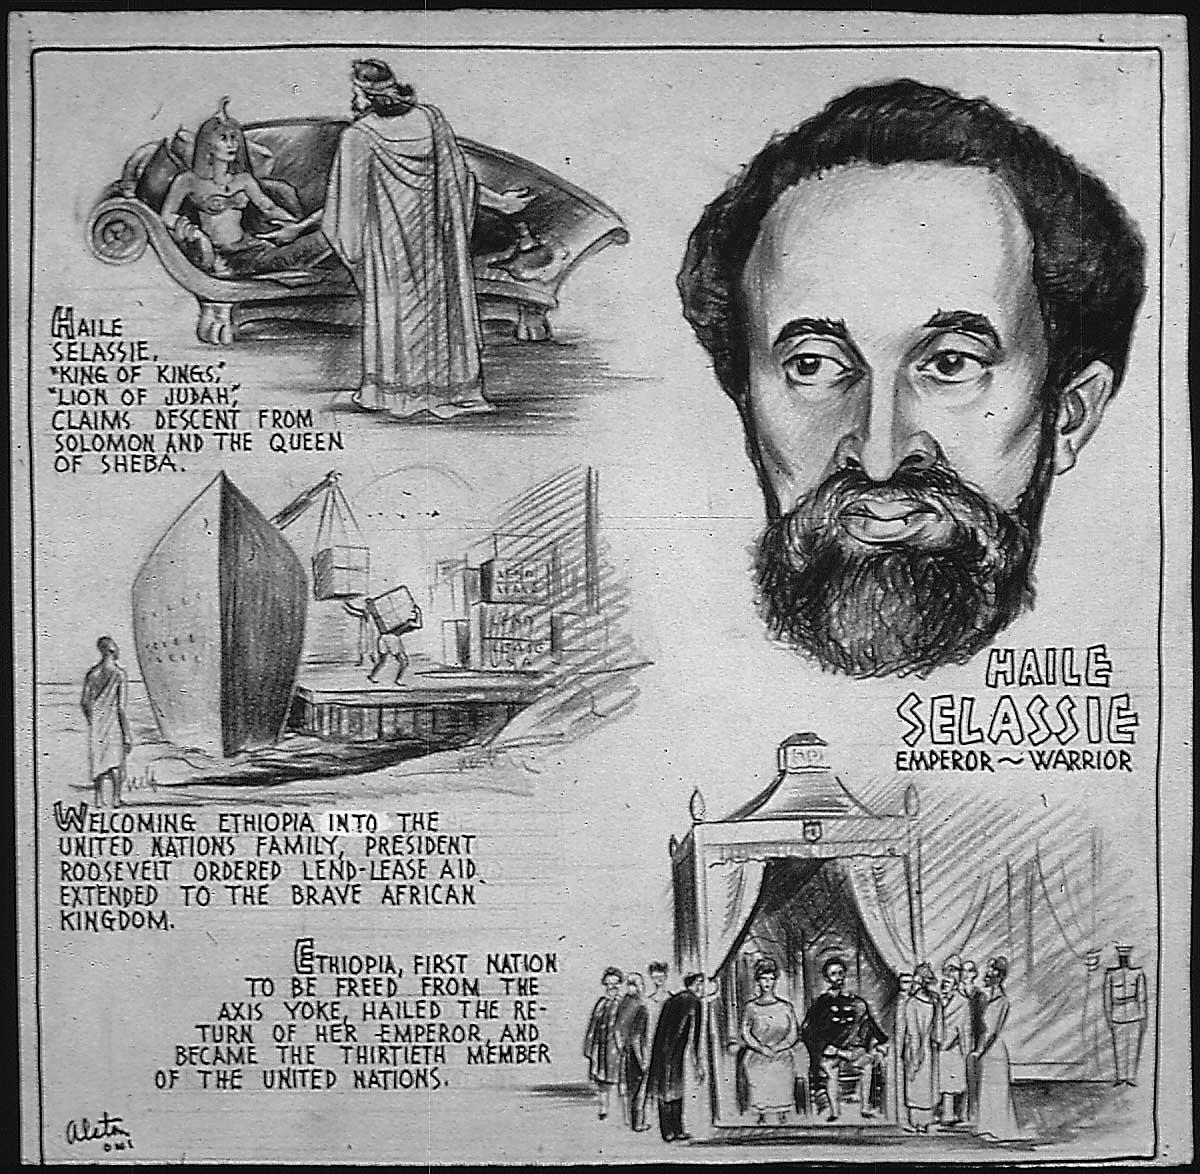 File:Haile Selassie - Emperor, Warrior, 1943.jpg - Wikimedia Commons